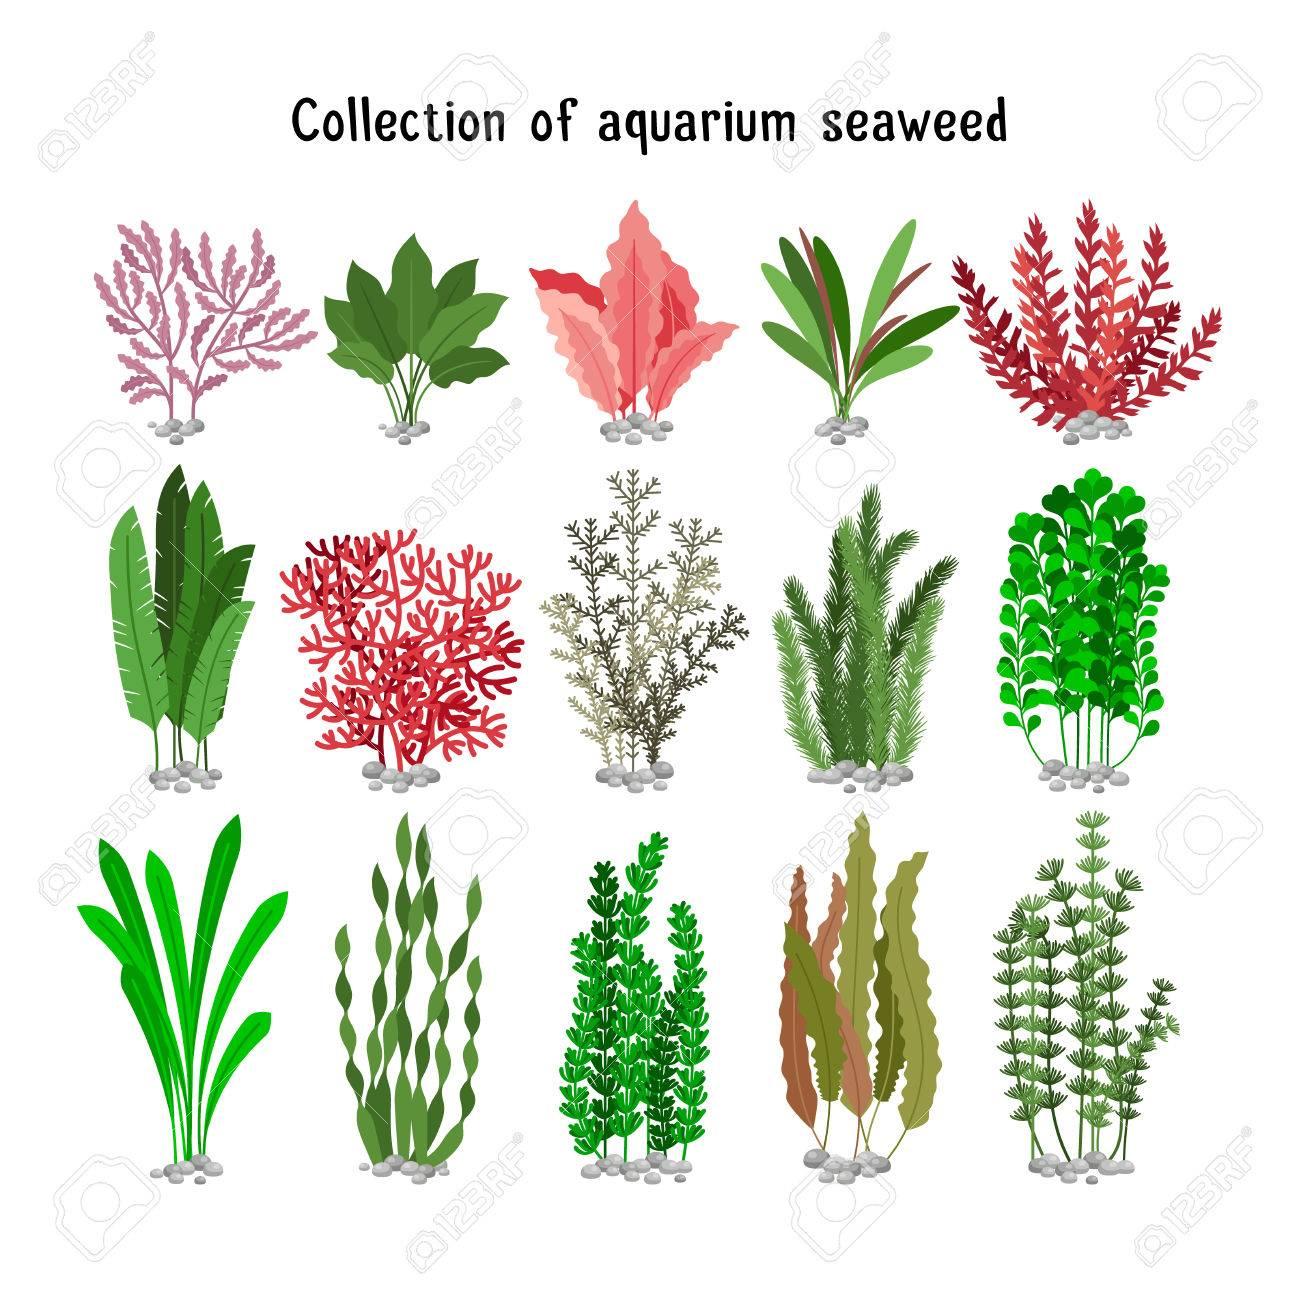 Seaweed set vector illustration. Yellow and brown, red and green aquarium seaweeds biodiversity isolated on white. Sea plants and aquatic marine algae - 69581598